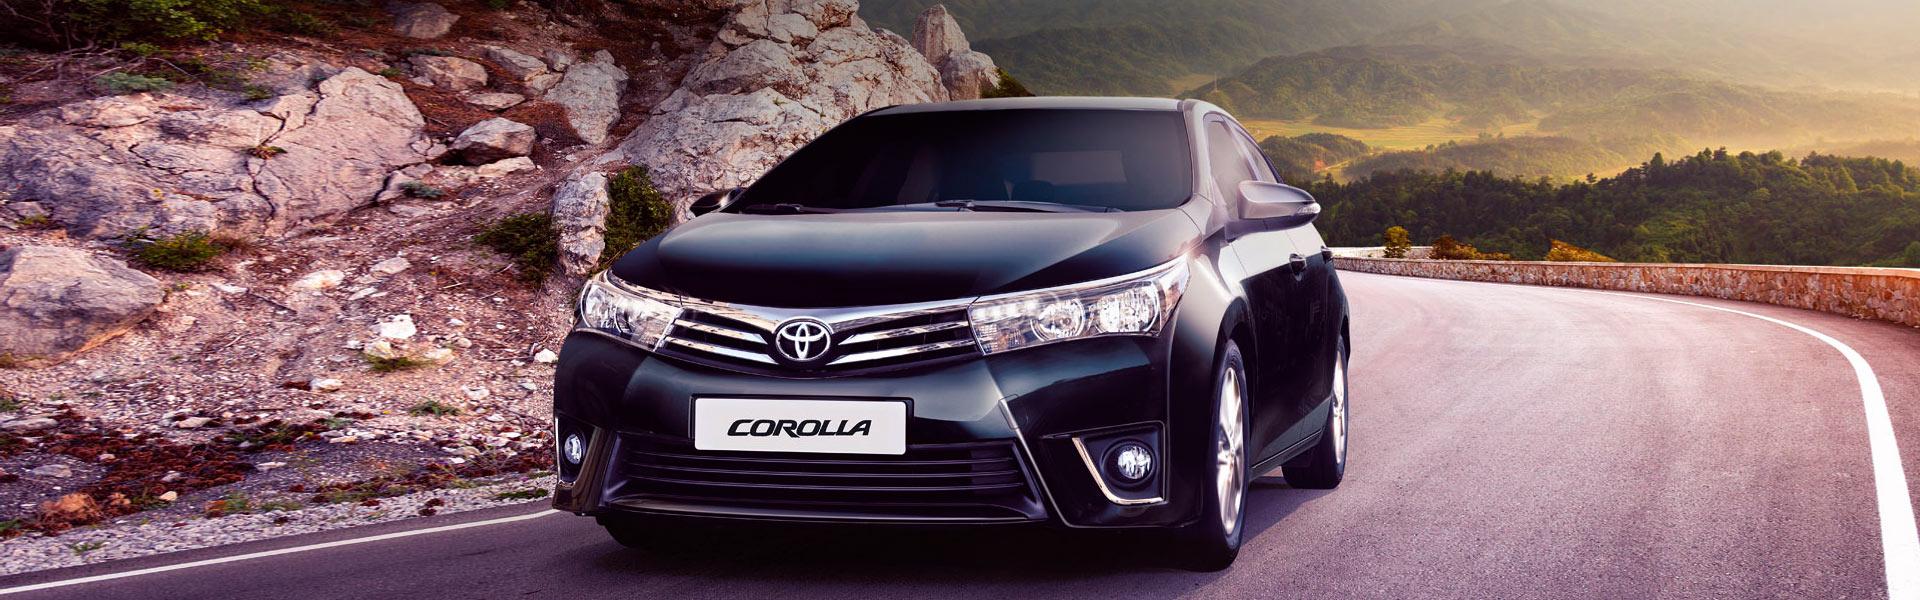 Пружины на Toyota Corolla